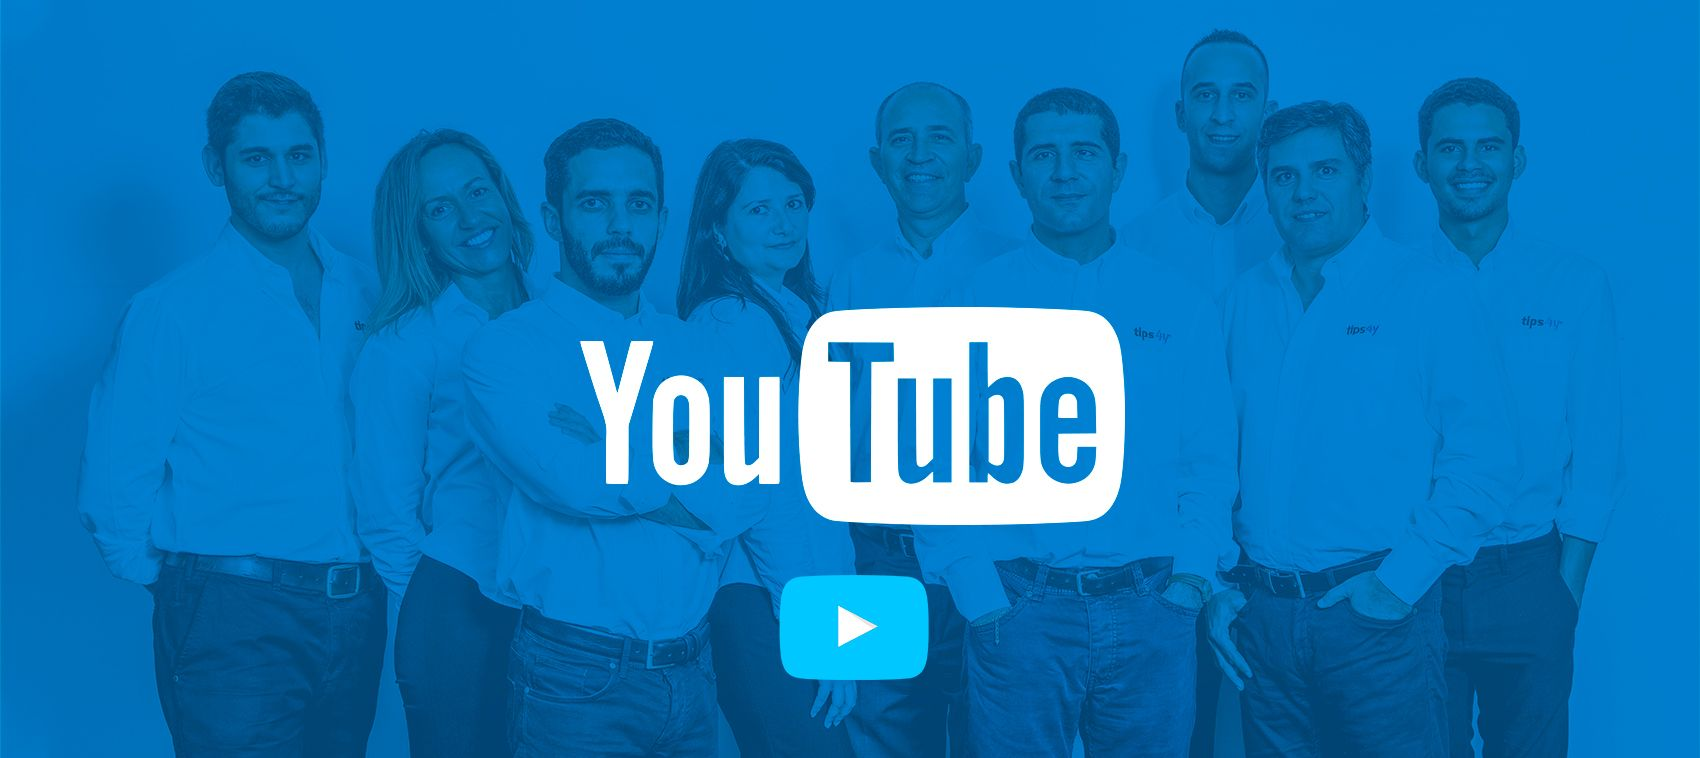 TIPS 4Y otimiza canal youtube